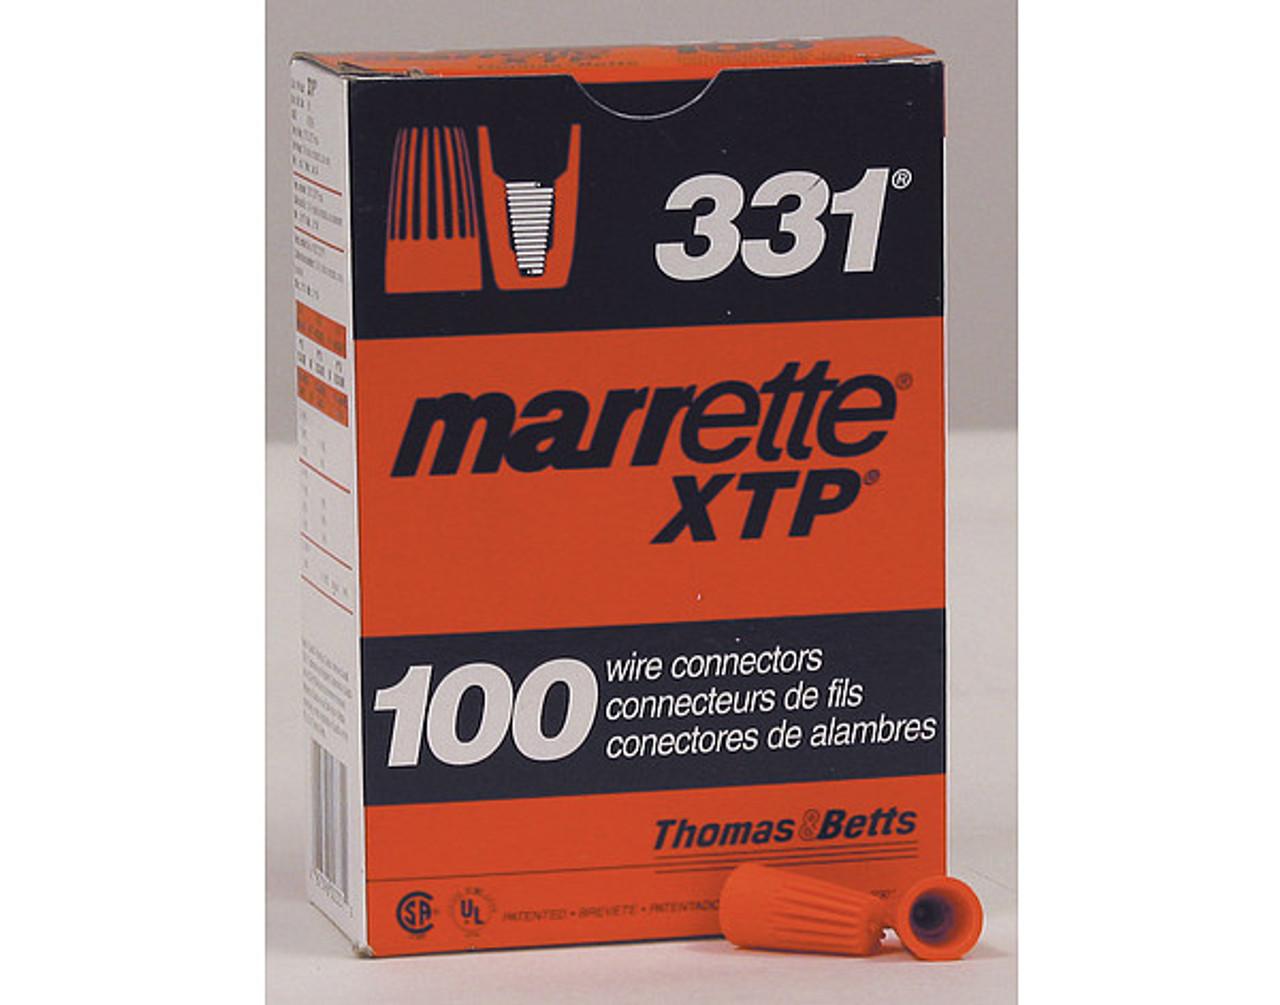 29-331 Marrett Orange Wire Connectors 100 count